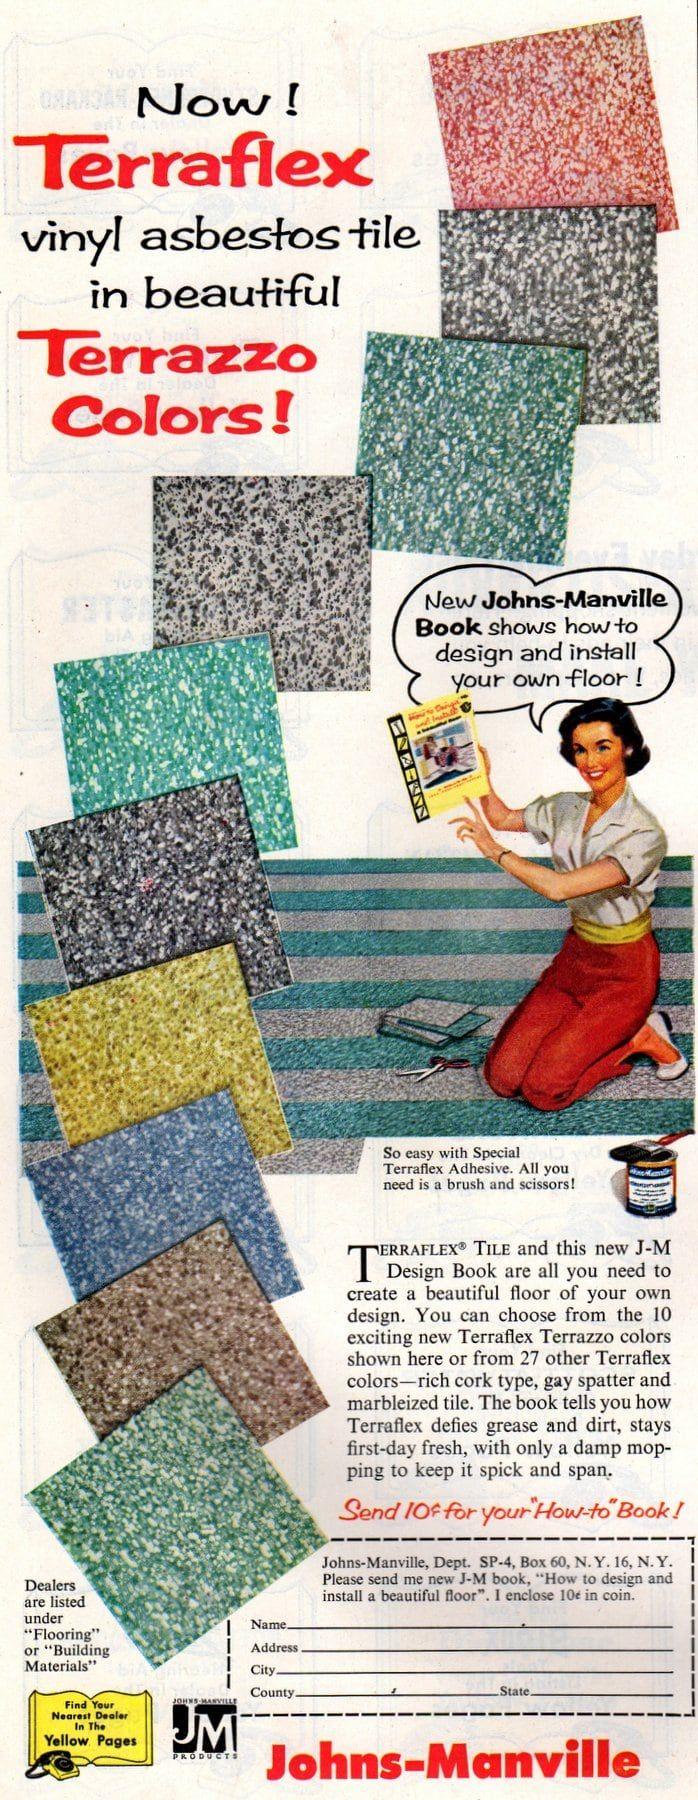 52+ Asbestos vinyl tile